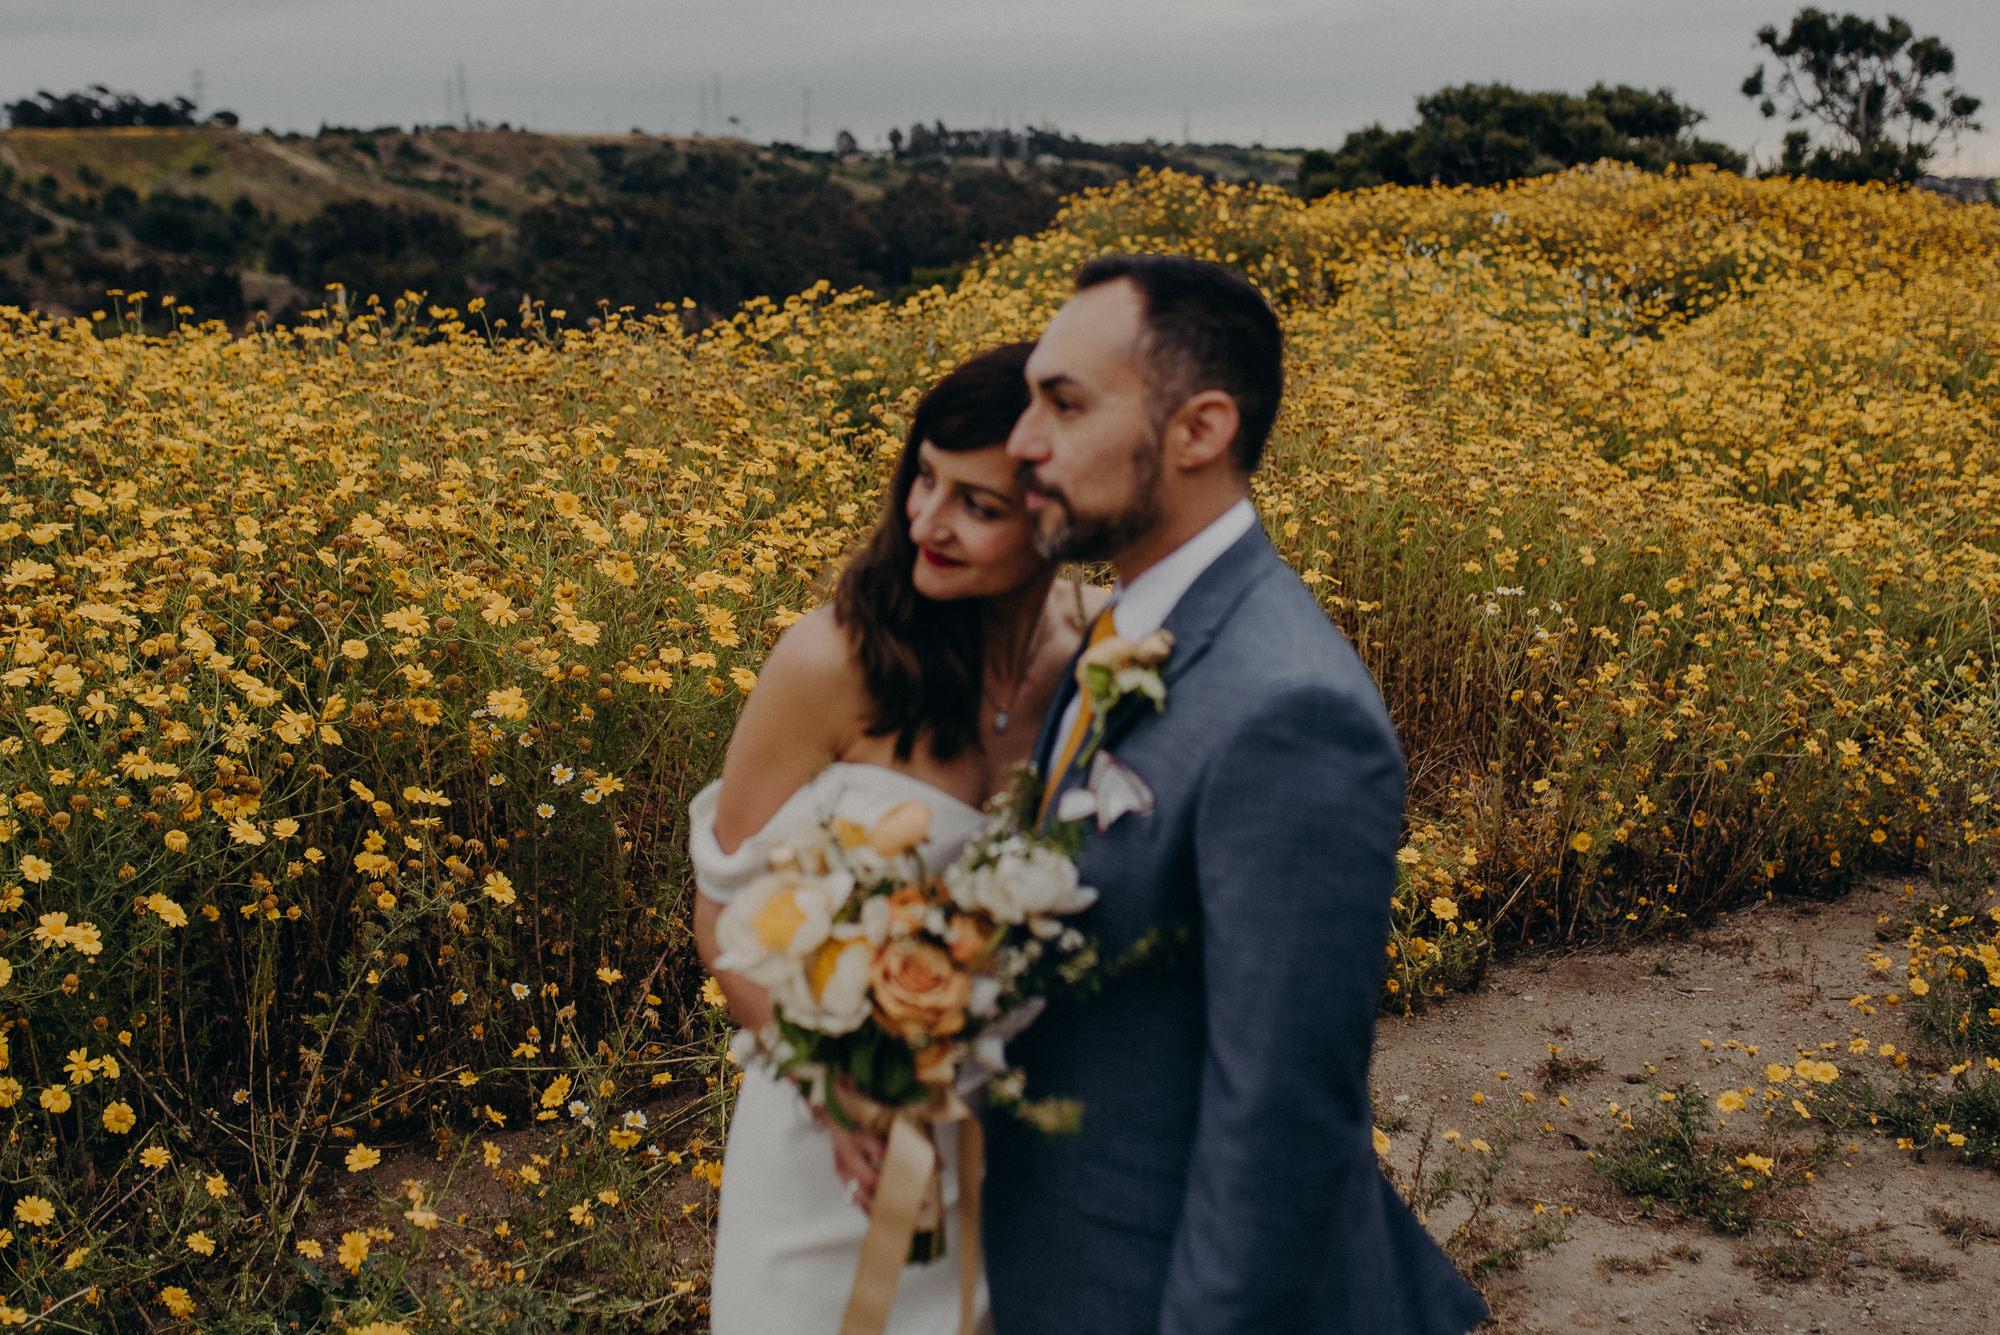 elopement photographer in los angeles - la wedding photographer - isaiahandtaylor.com-032.jpg